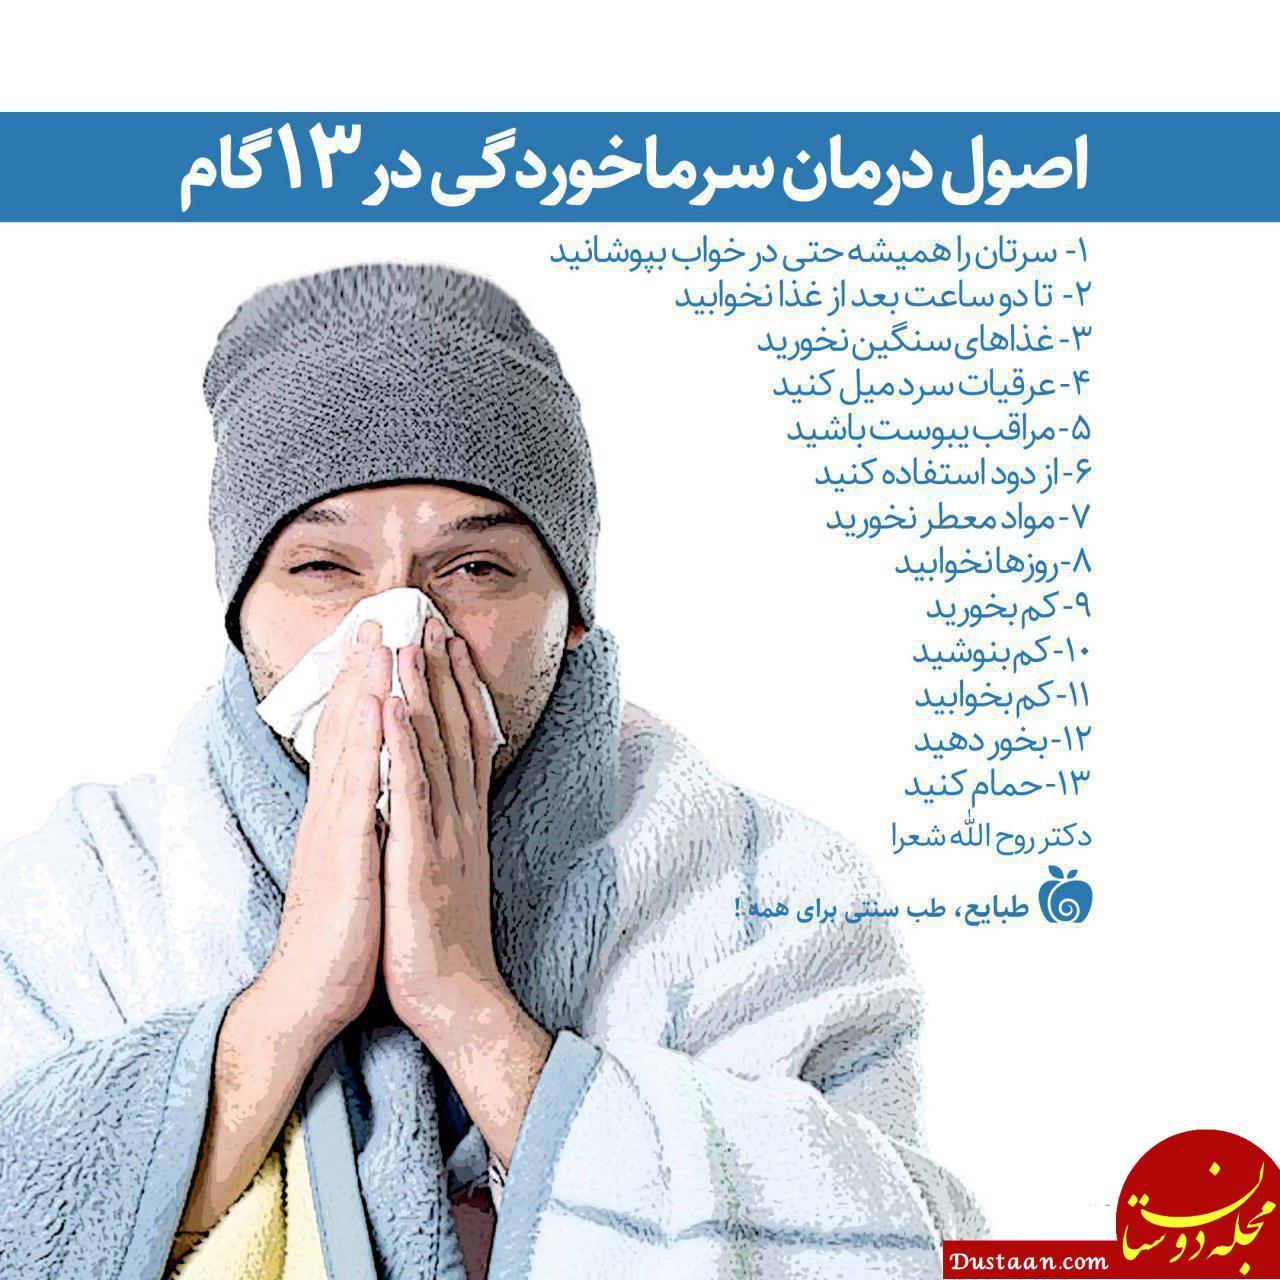 www.dustaan.com درمان سریع سرماخوردگی در 13 گام! +عکس